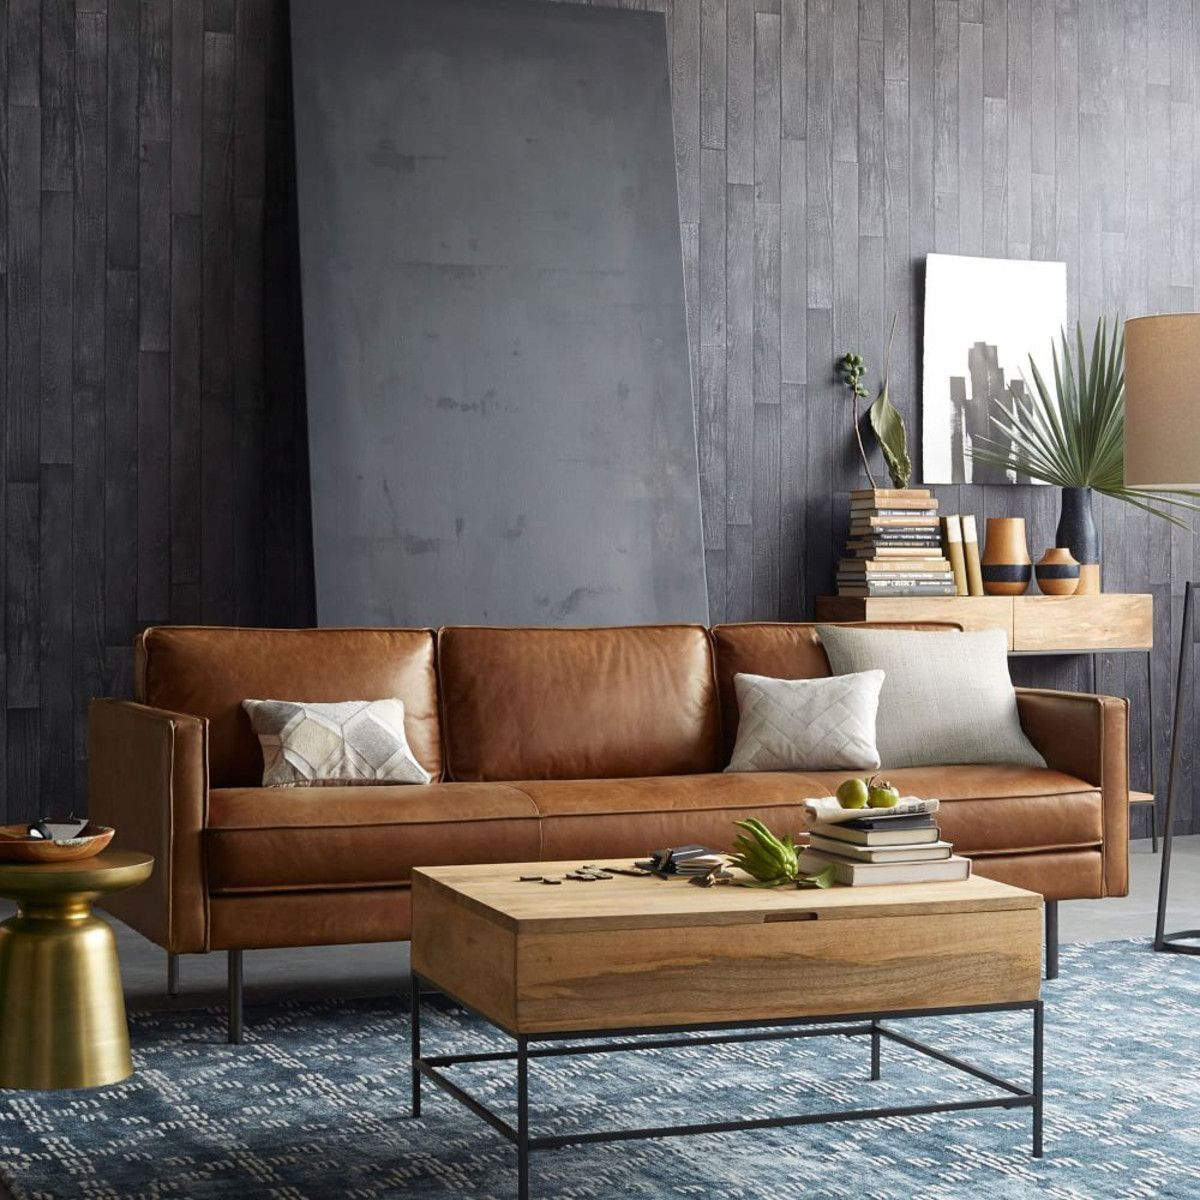 Stunning modern leather sofa design for living room (34)